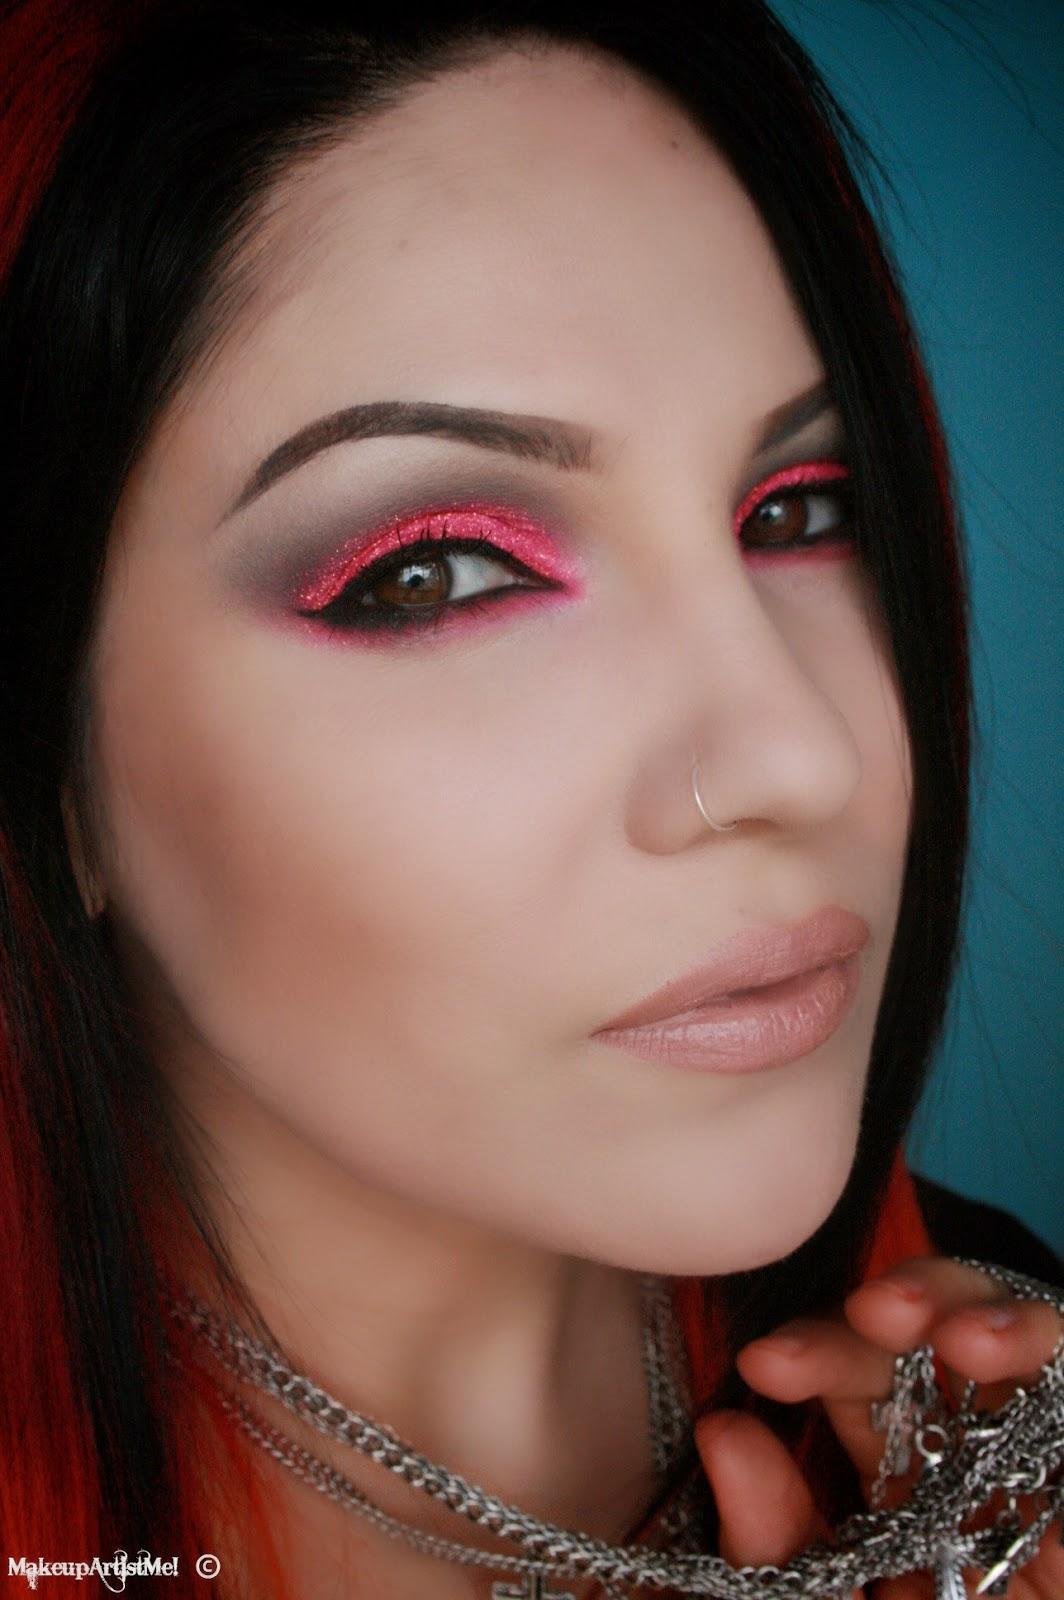 Pink Makeup Brushes: Make-up Artist Me!: Hot For Pink! Makeup Tutorial